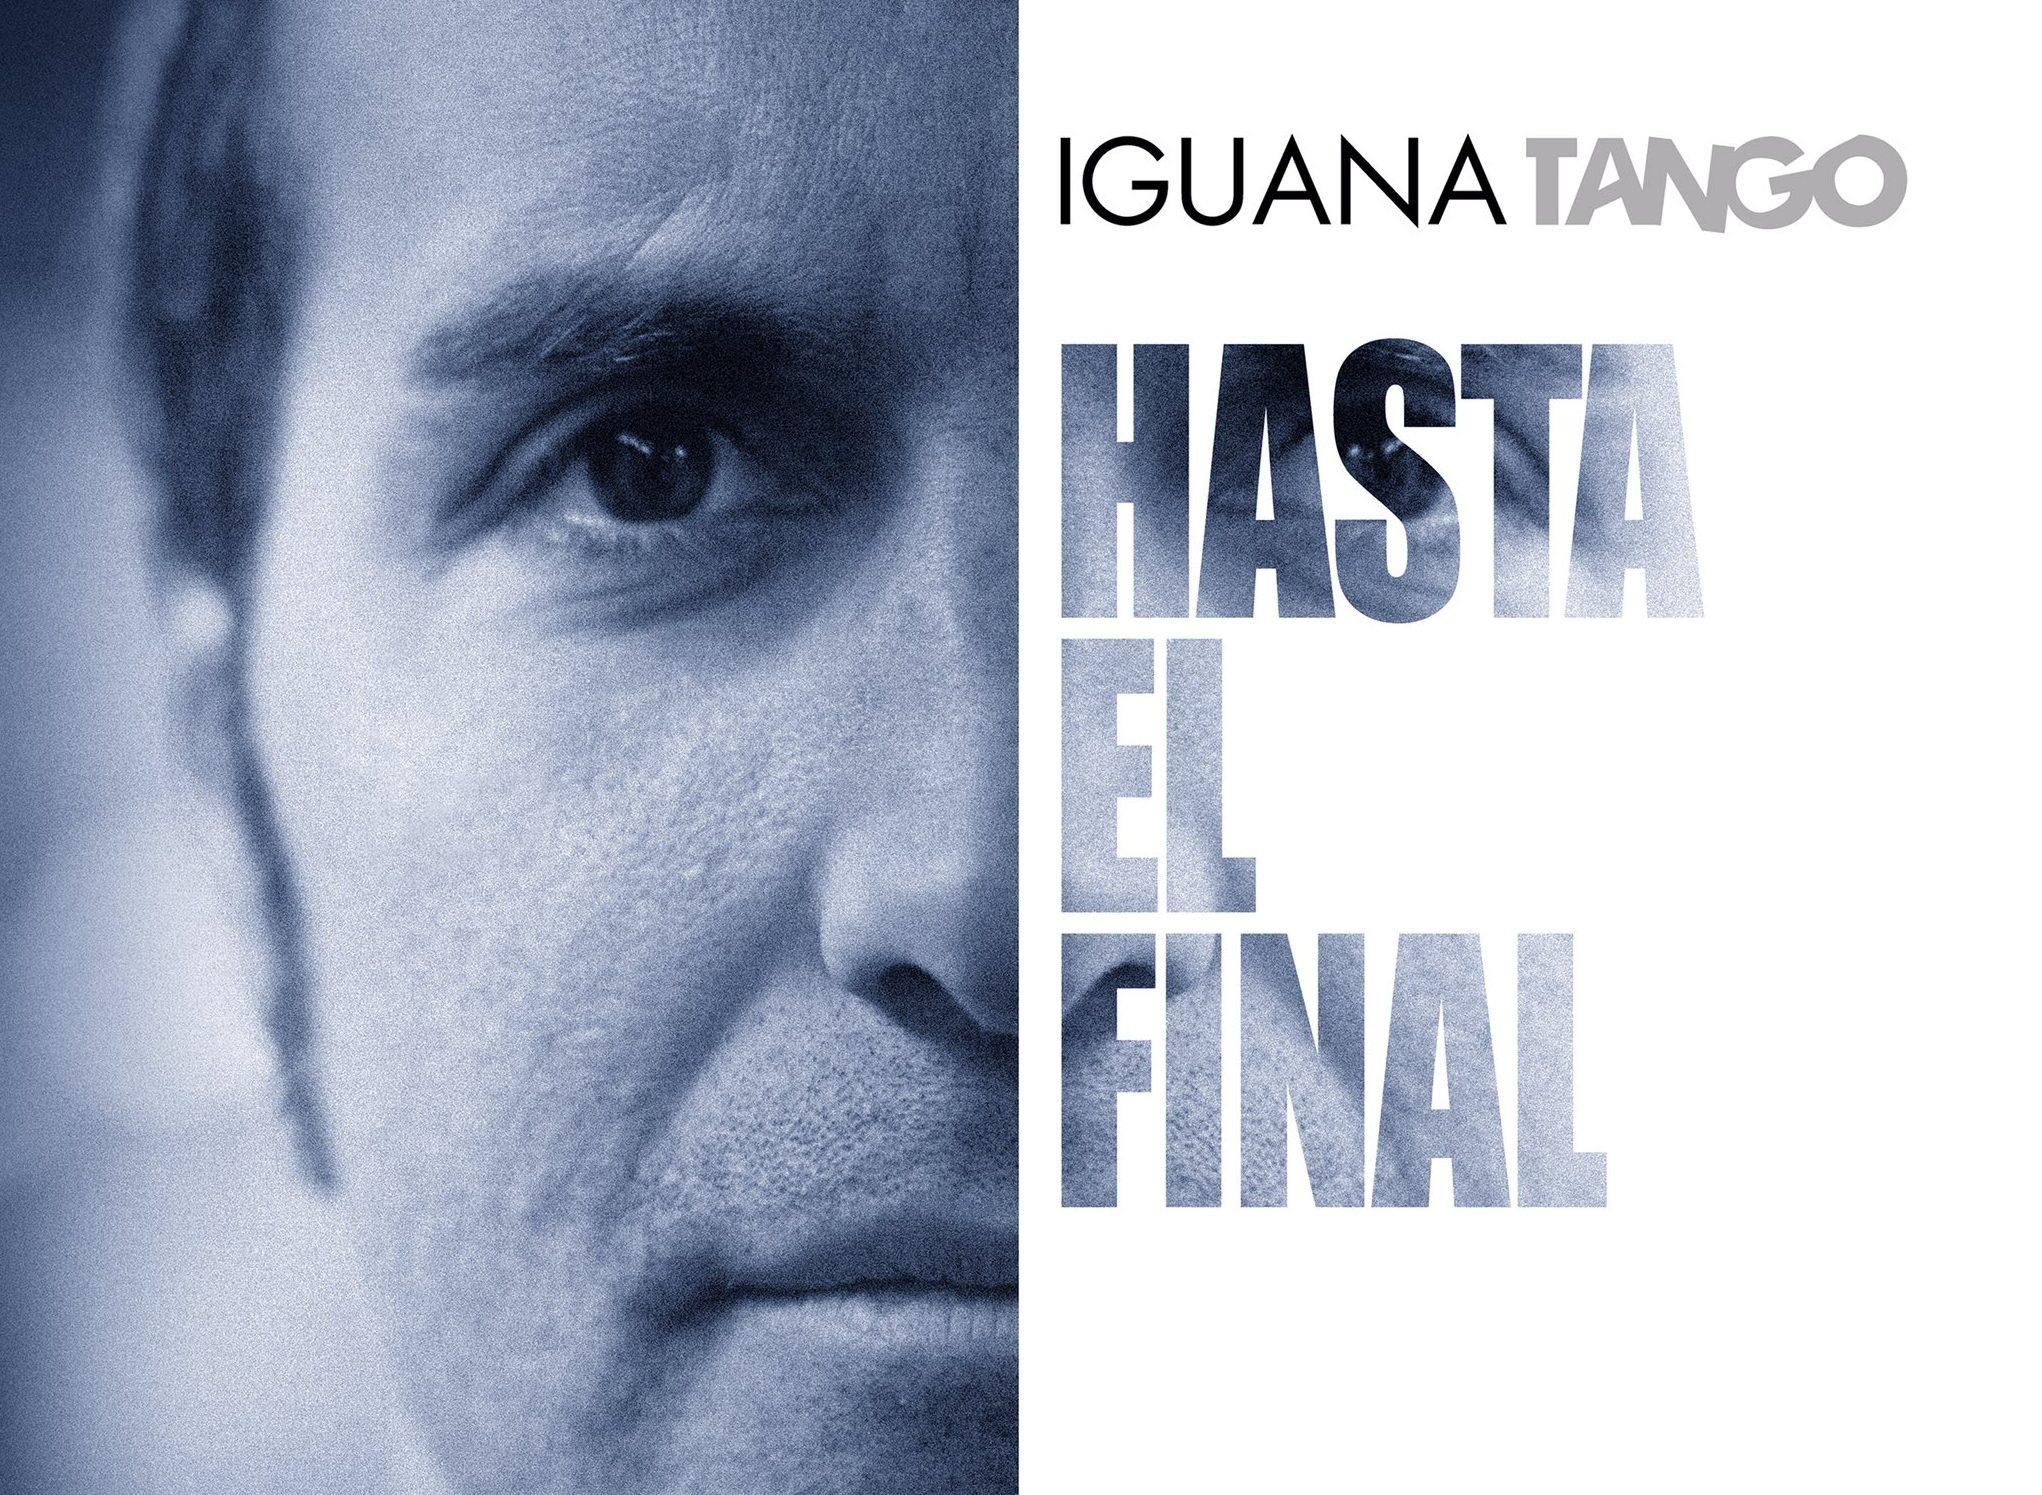 iguana-tango